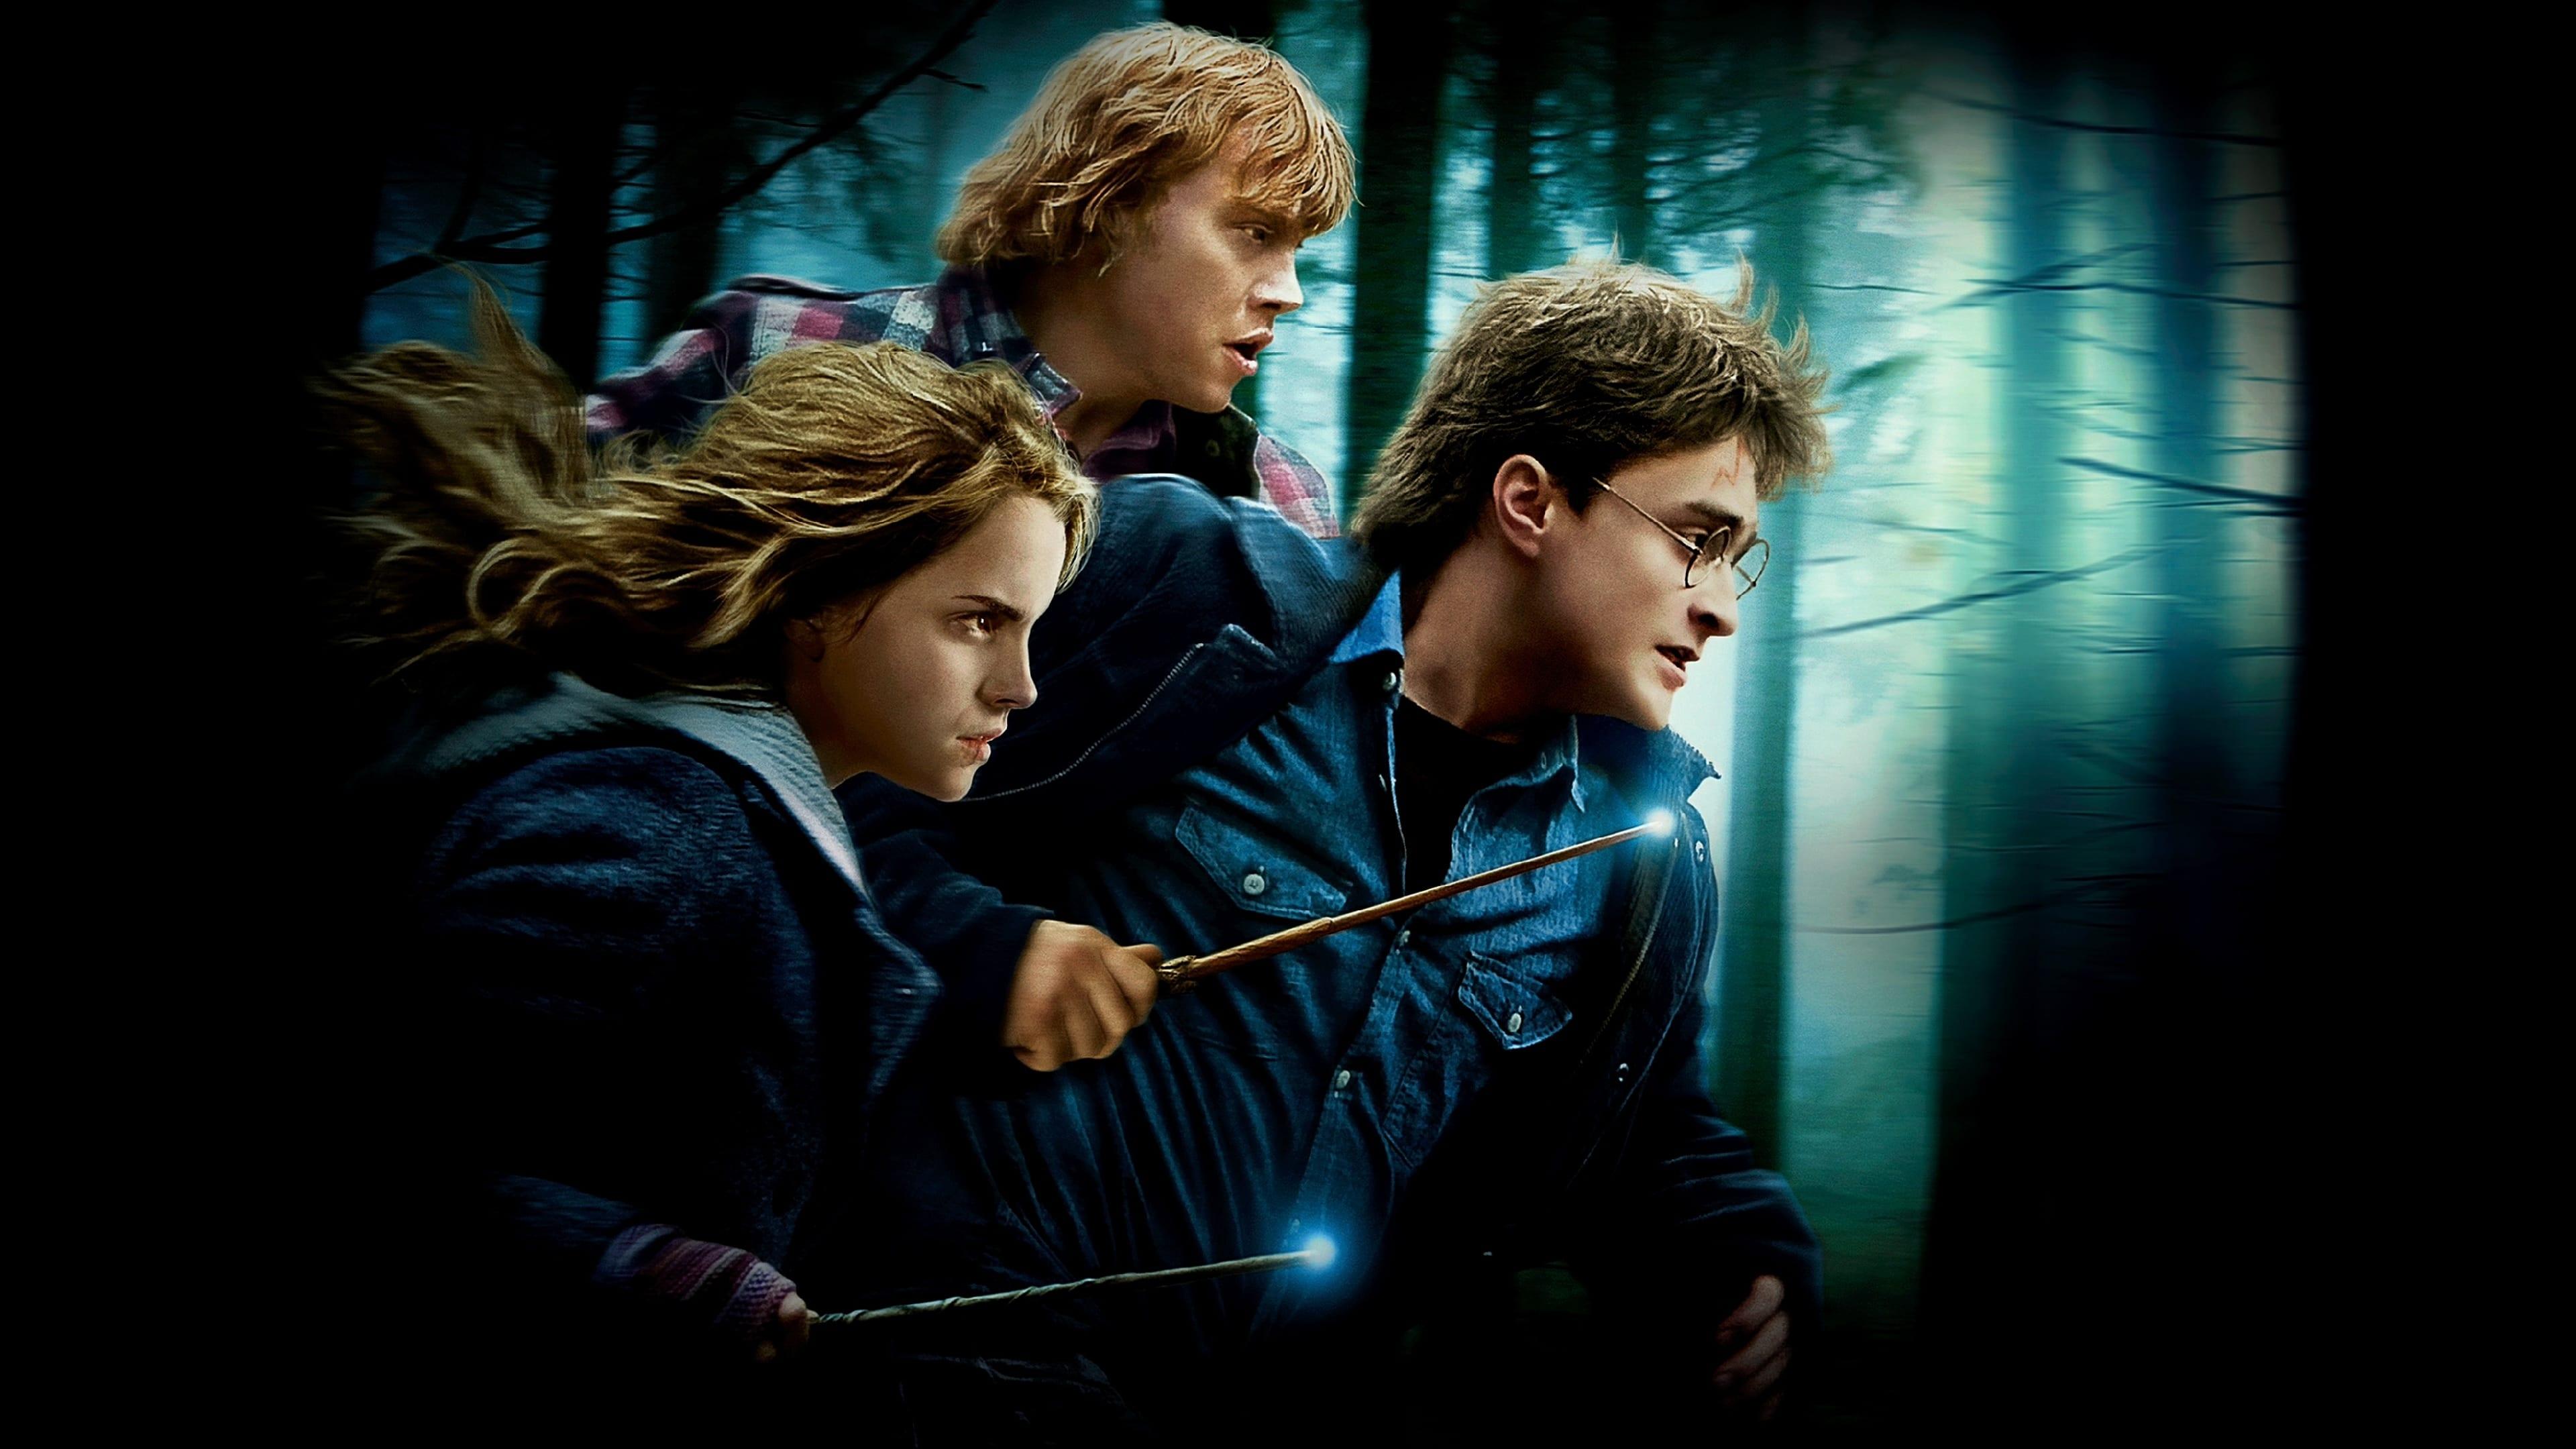 Harry Potter Part 1 Online